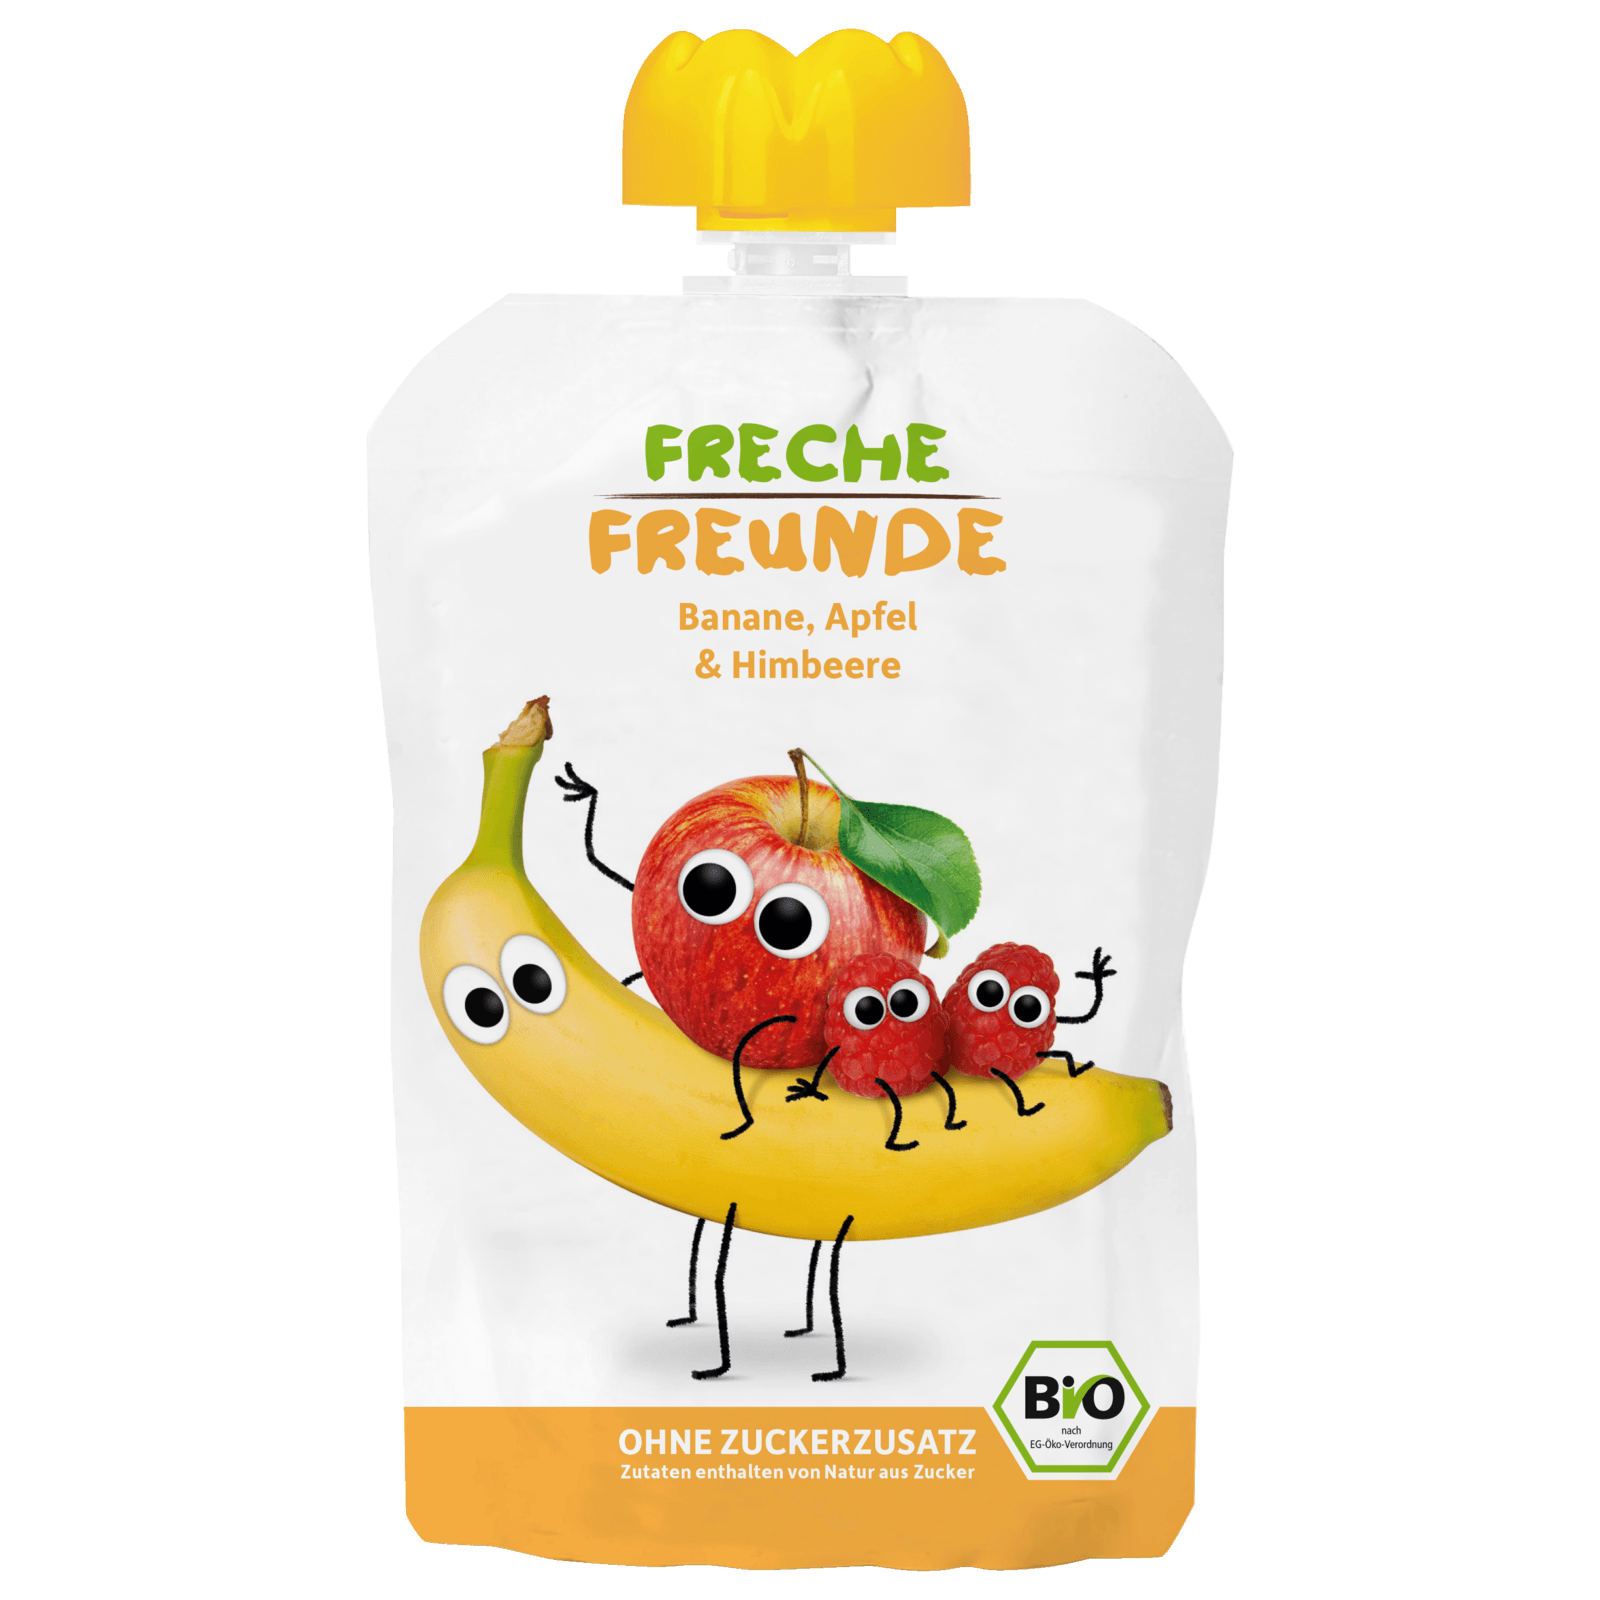 Erdbär Freche Freunde Apfel, Banane & Himbeere 100g